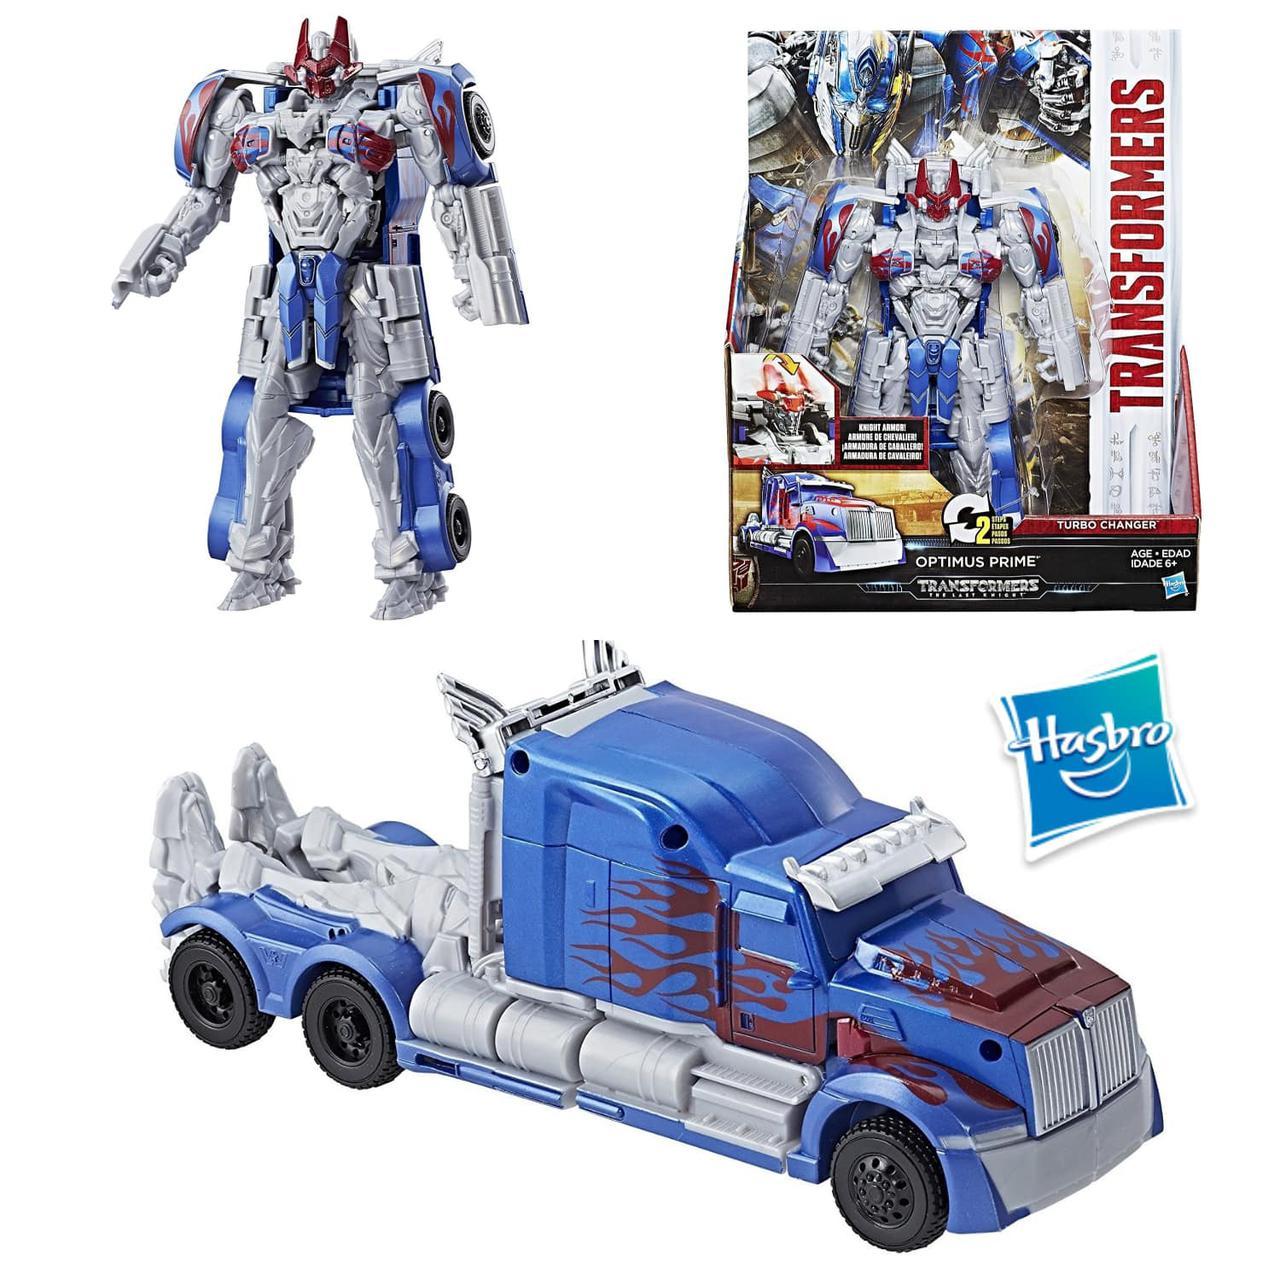 Трансформеры Хасбро Оптимус Прайм последний рыцарь Turbo Changer Optimus Prime